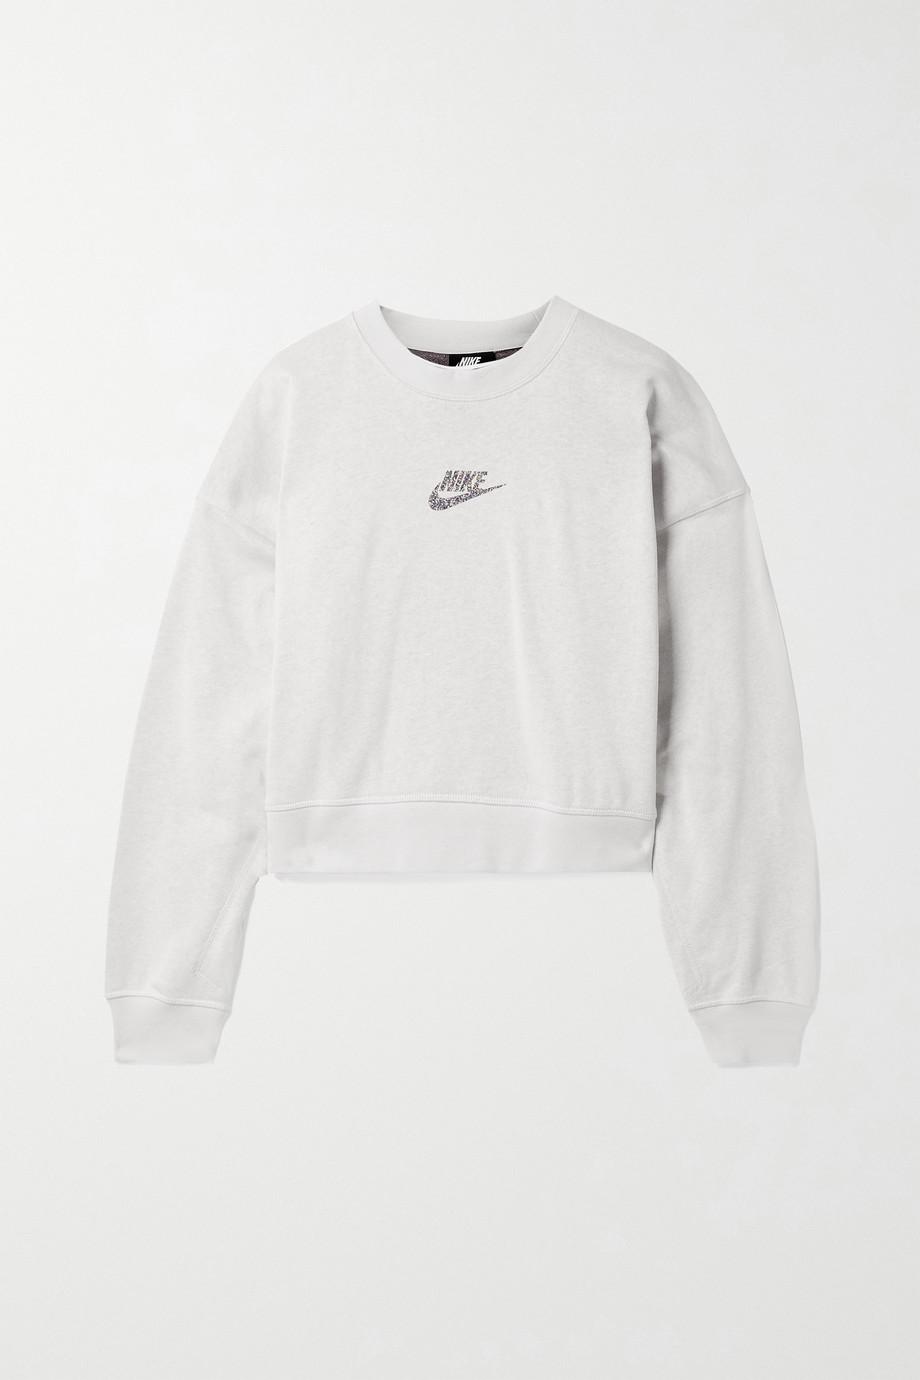 Nike Sportswear oversized cropped printed cotton-blend jersey sweatshirt